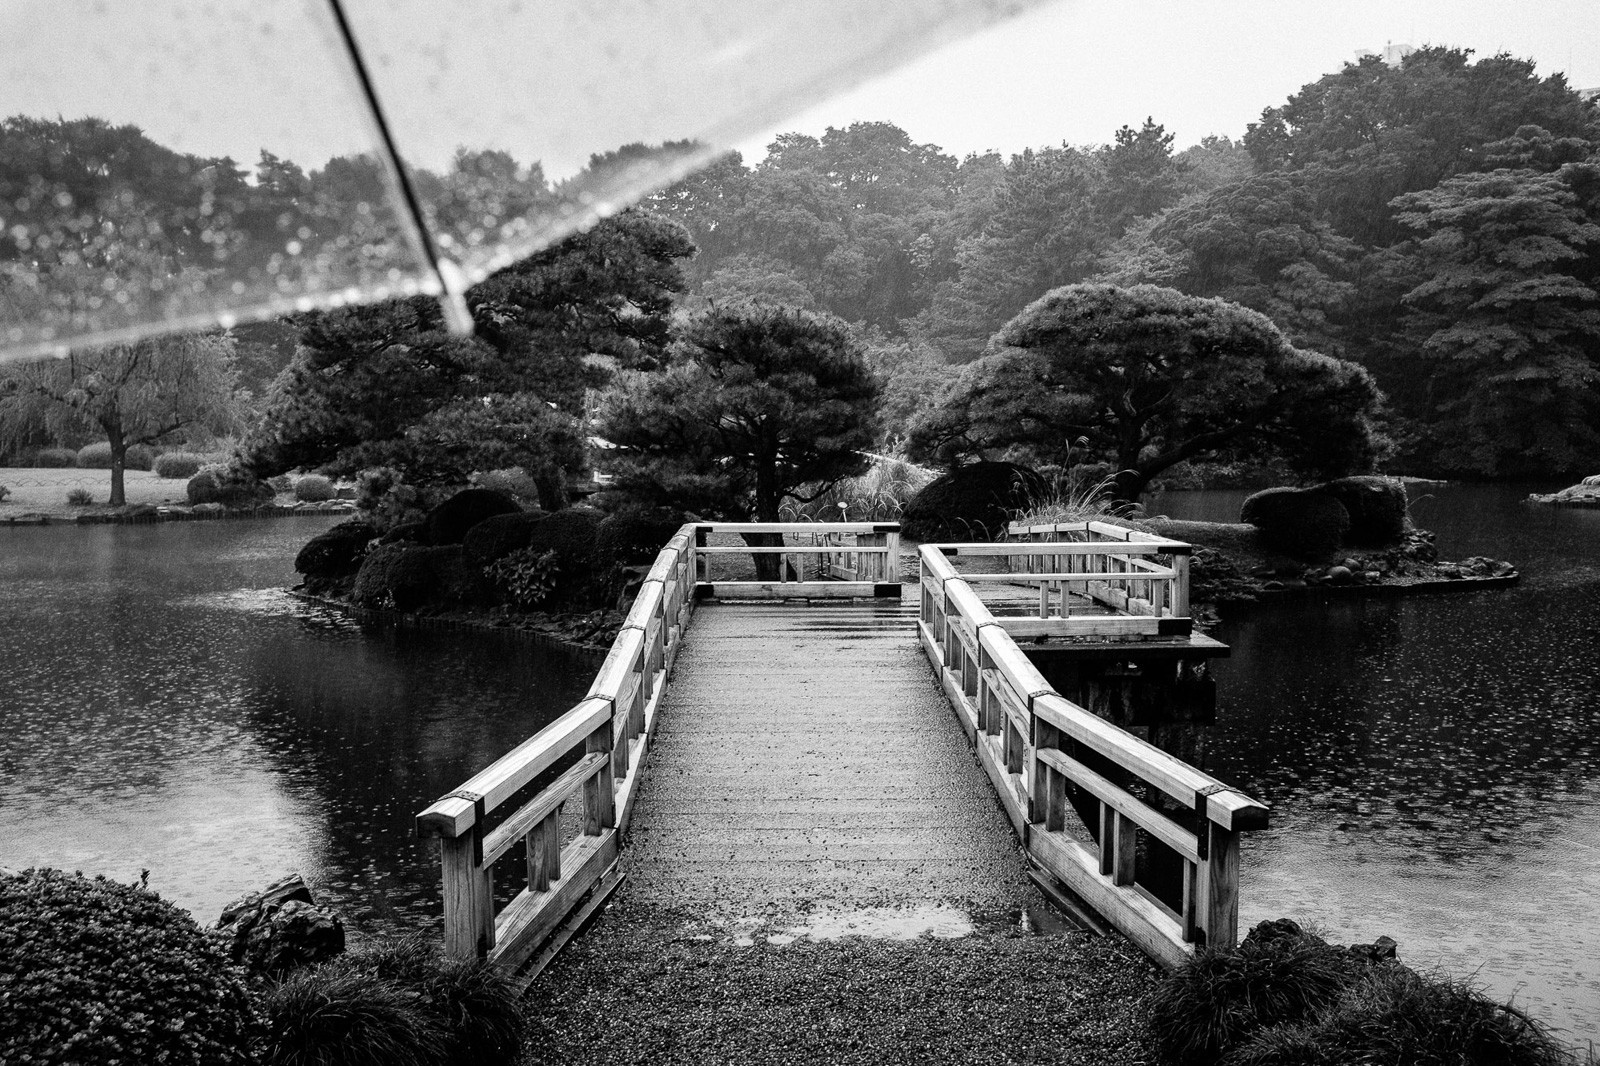 tokyo-rains-1.jpg